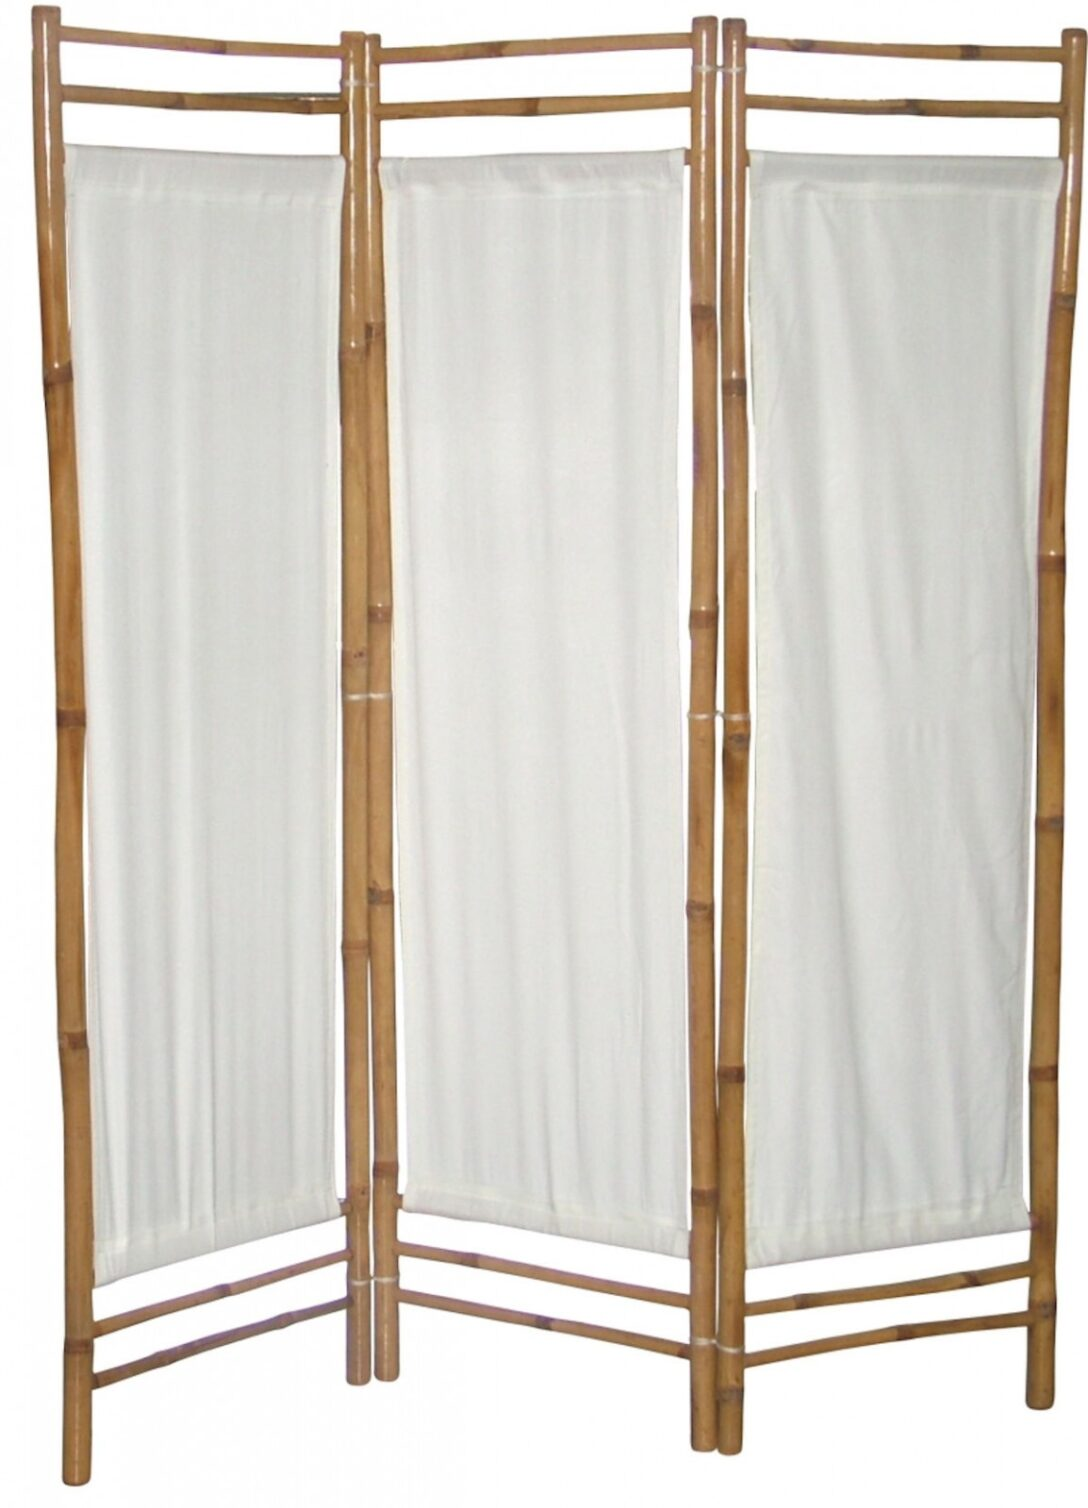 Large Size of Paravent Bambus Raumteile 3 45 Cm H 160 Garten Bett Wohnzimmer Paravent Bambus